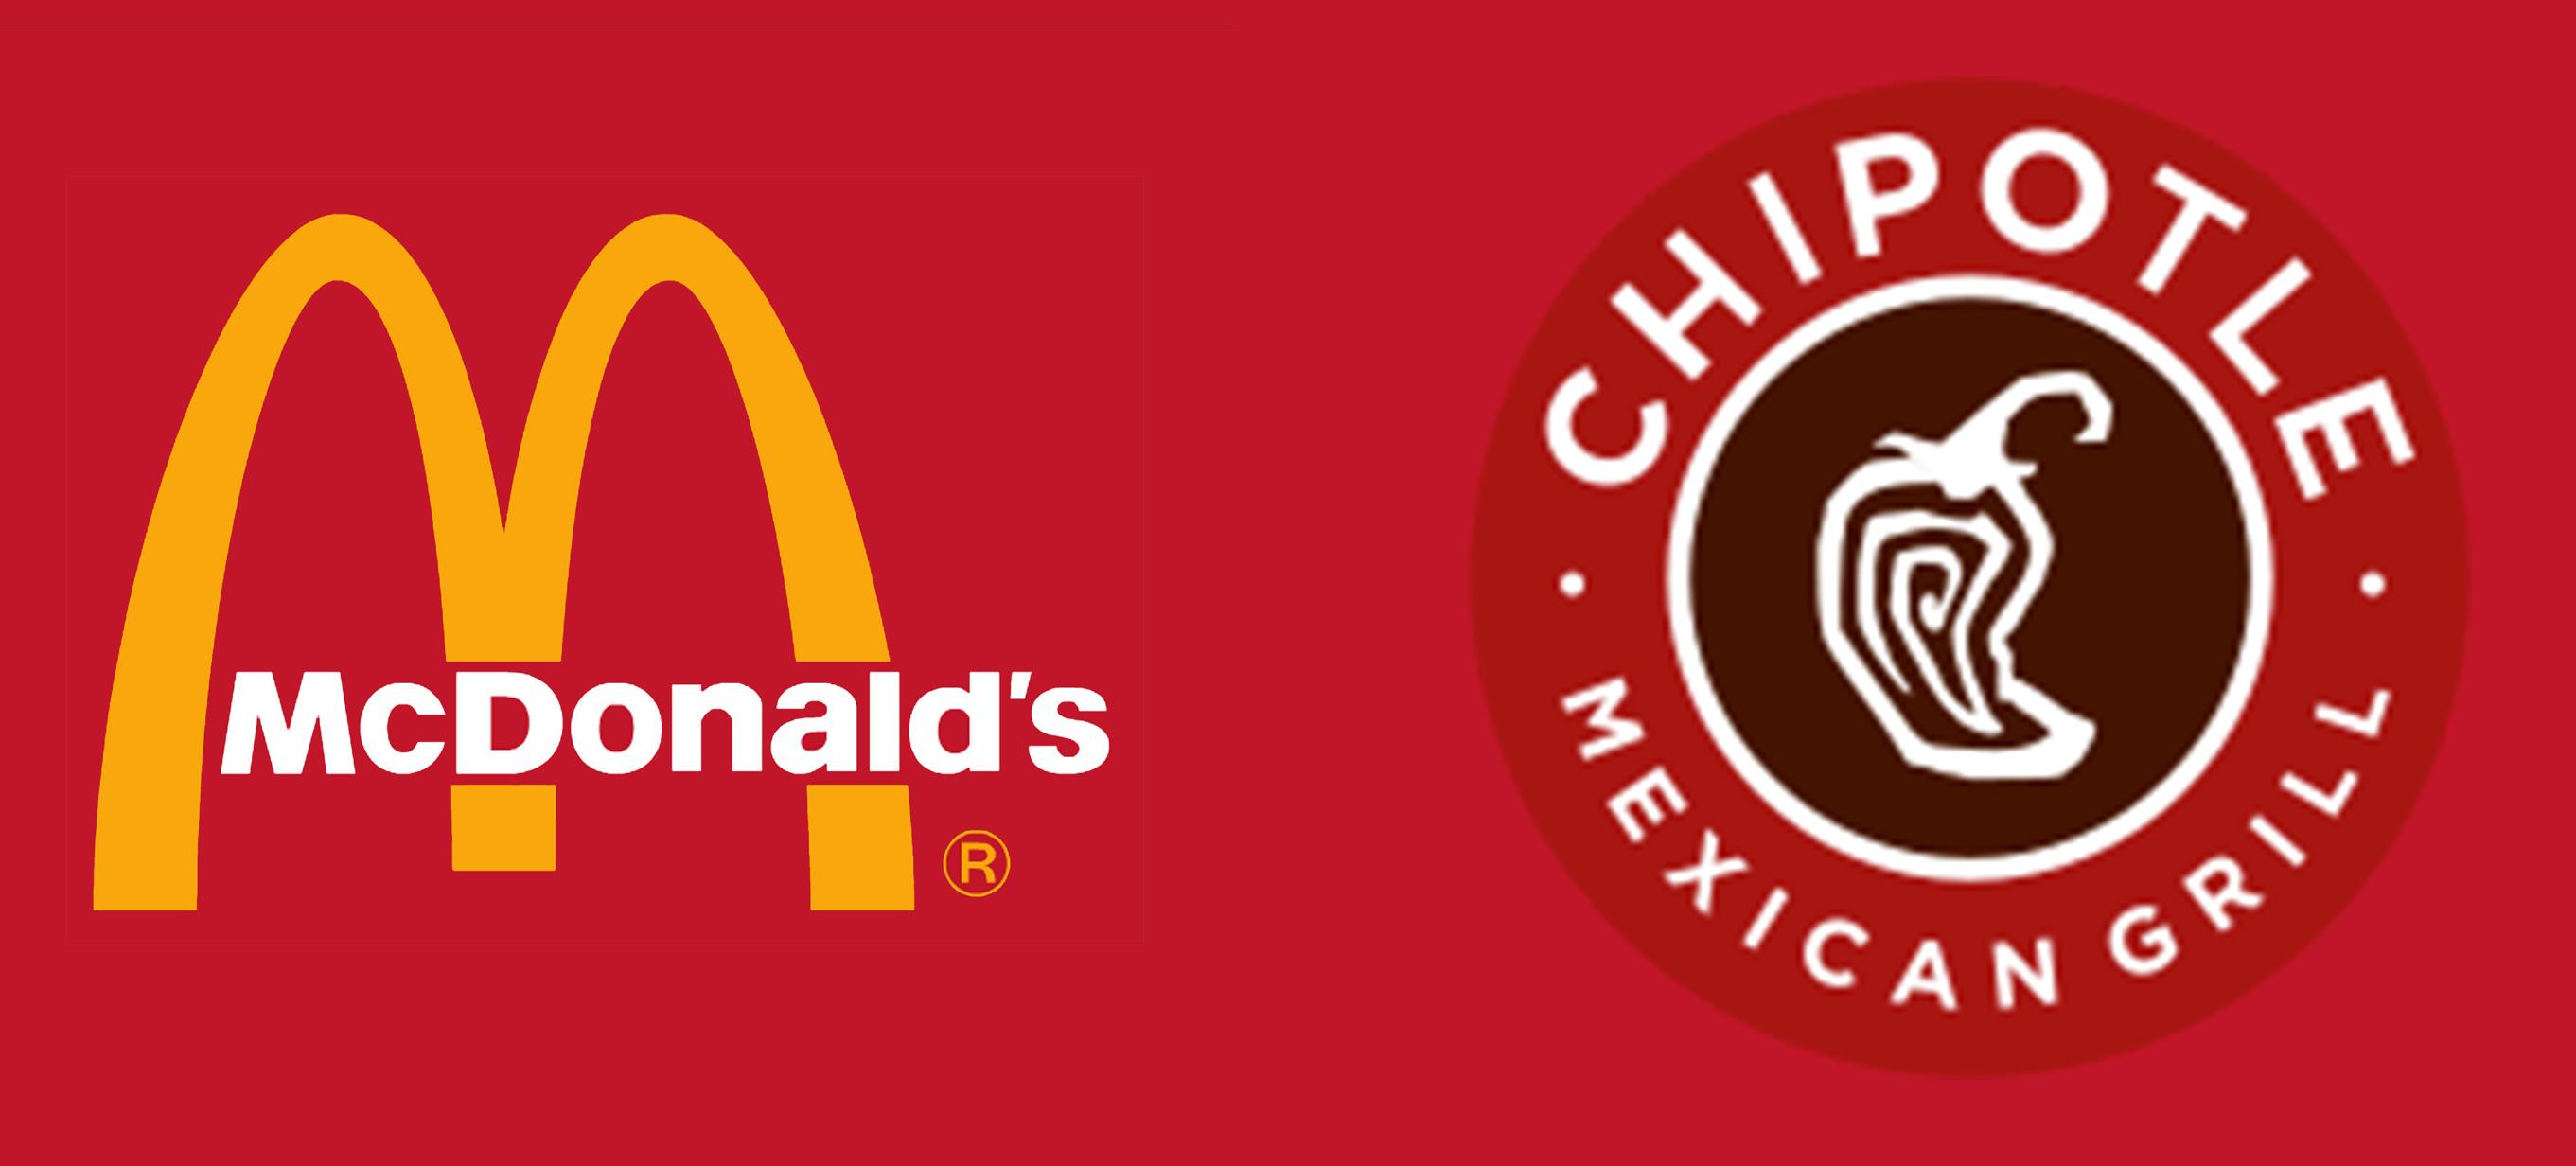 Grill Chipotle Mcdonalds